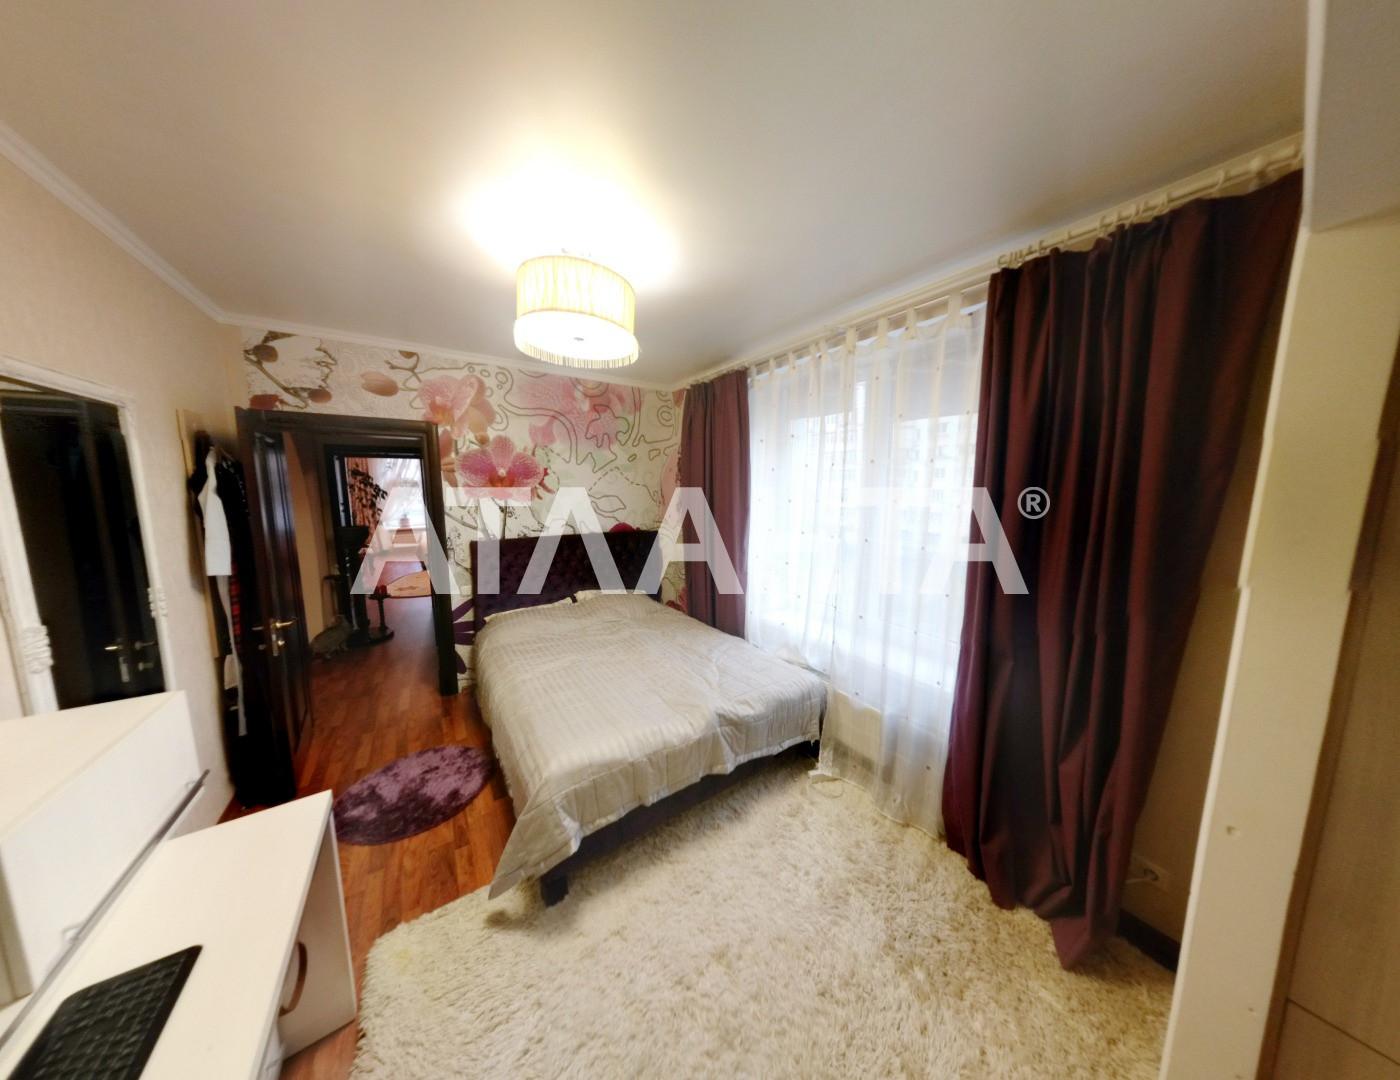 Продается 3-комнатная Квартира на ул. Ул. Ломоносова — 139 600 у.е. (фото №15)